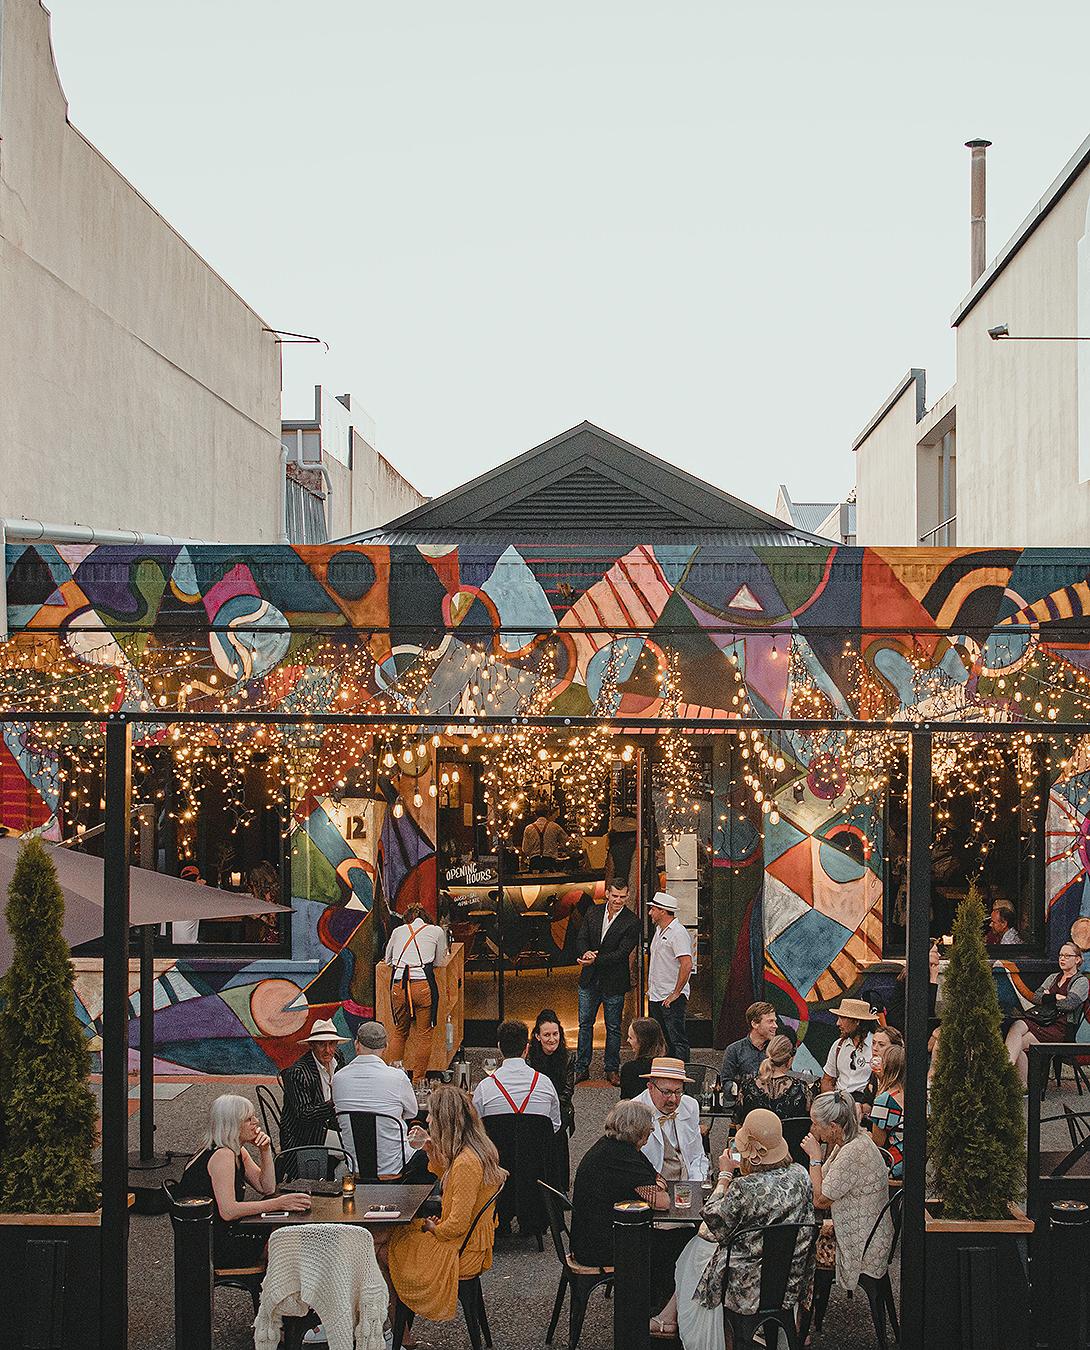 People enjoying alfresco dining at a well lit wine bar.